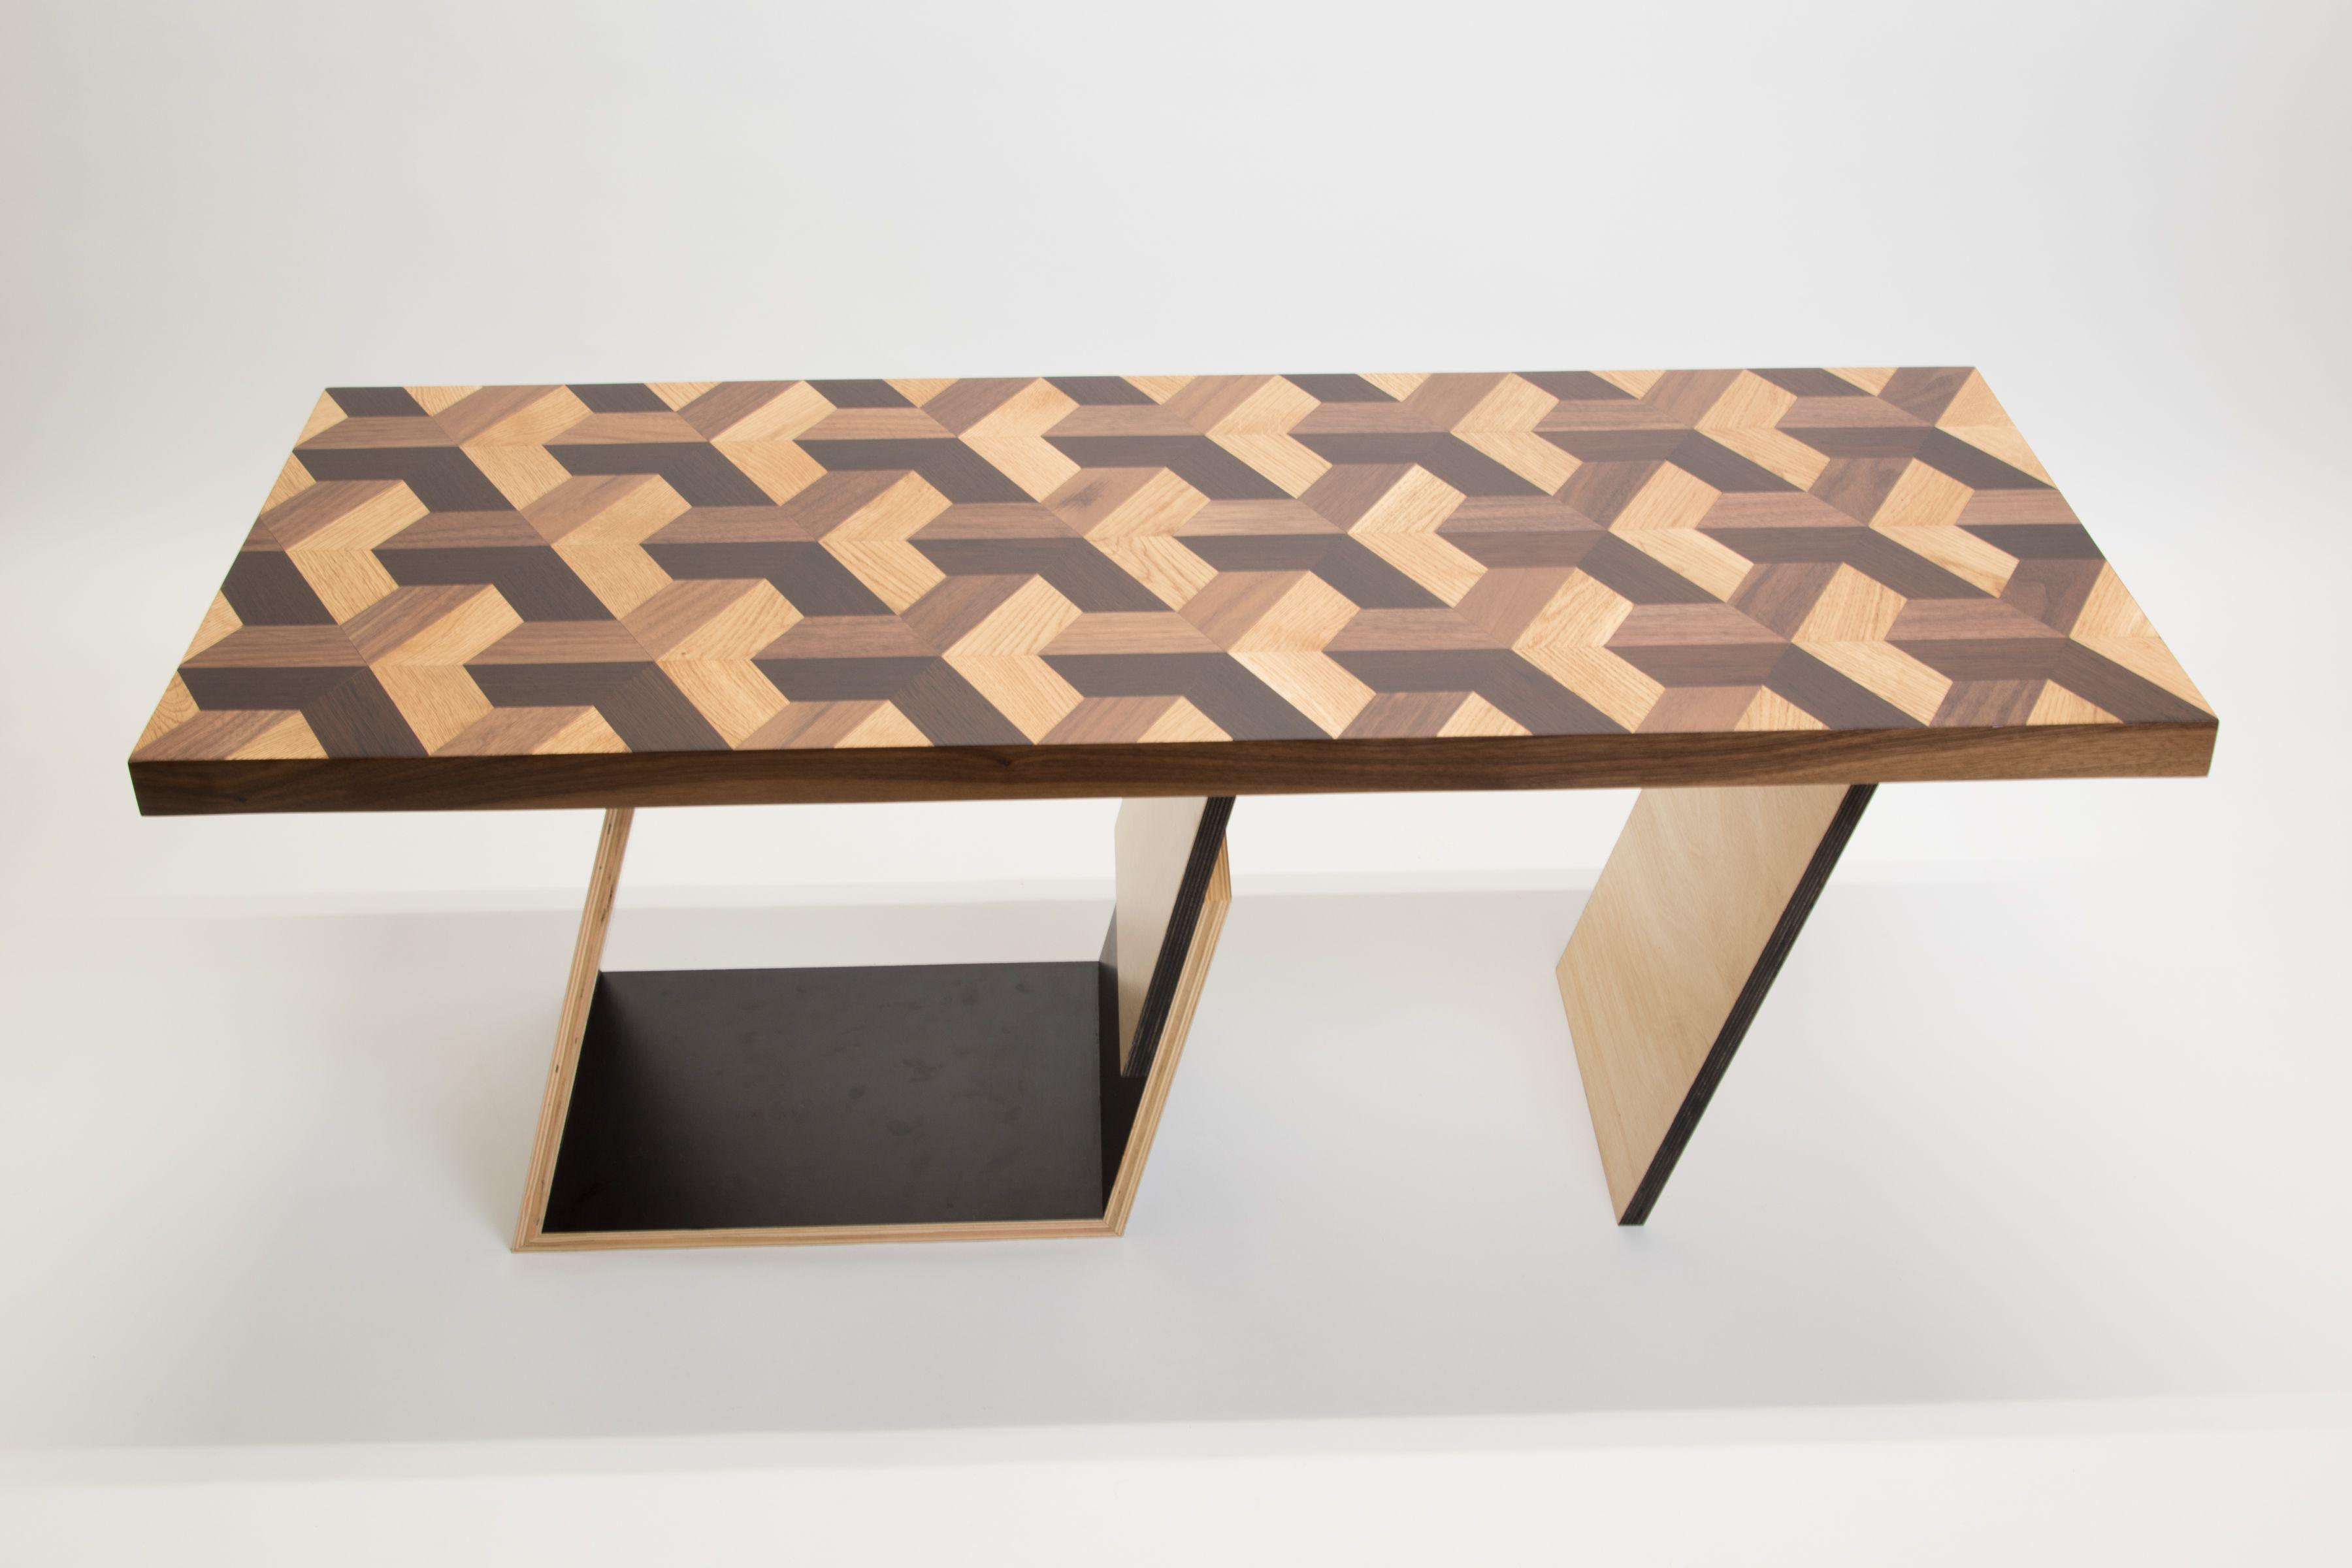 Handmade 3d Design Coffee Table Unique Incredible Http Prestigebespoketables Co Uk Handmade 3d Design Coffee Table Wood Made Coffee Table Coffee Table [ 2400 x 3600 Pixel ]